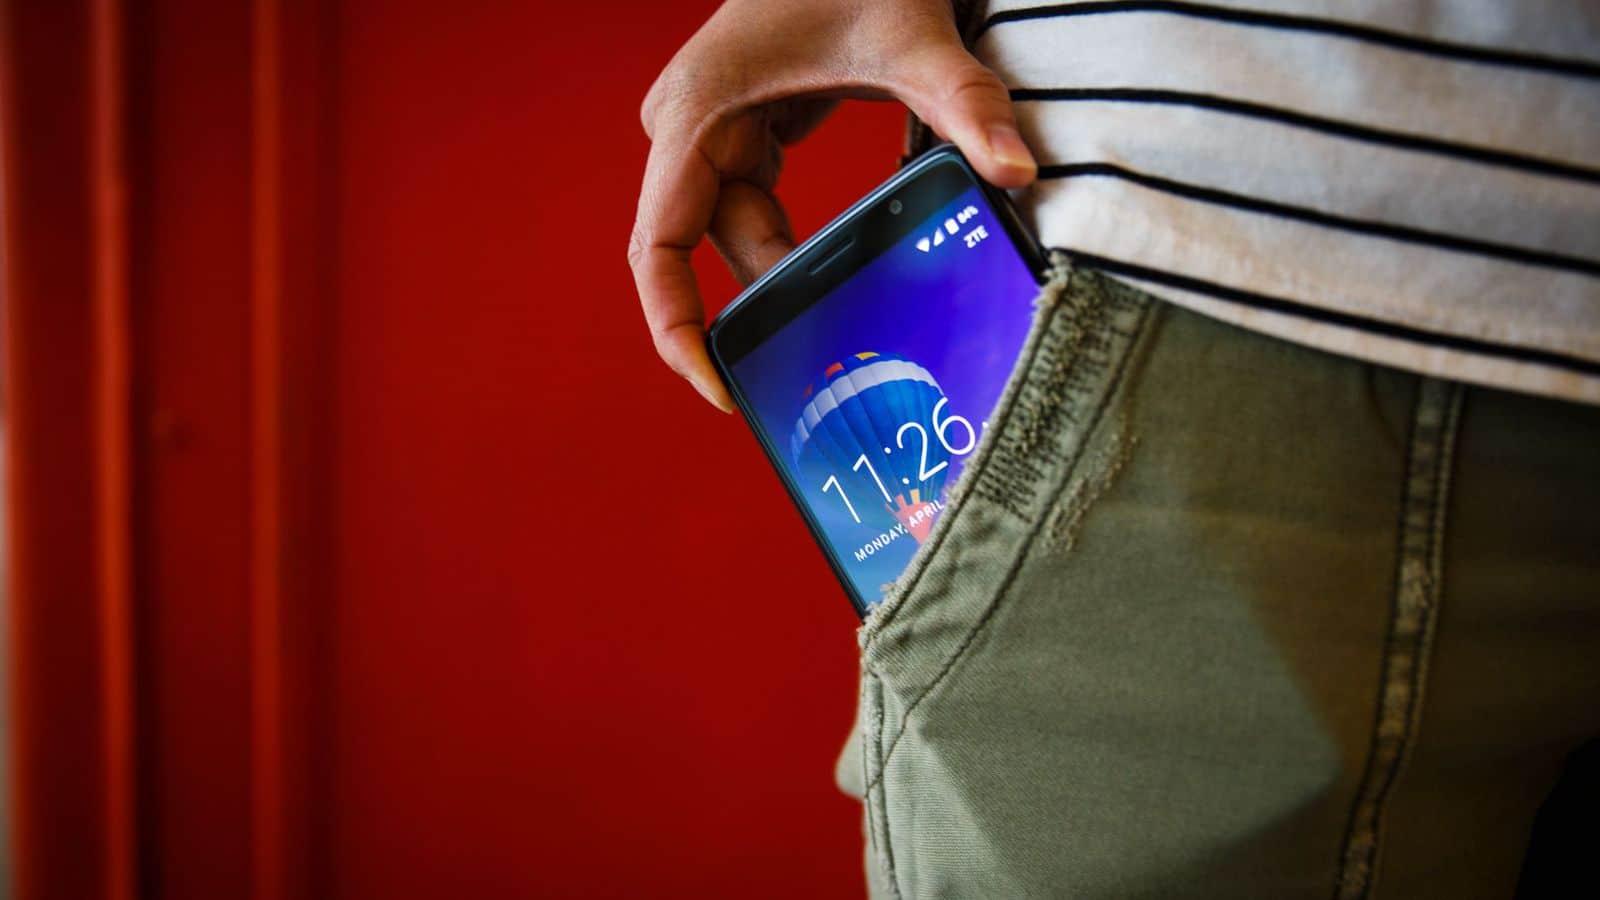 smartphones phablettes norme 2021